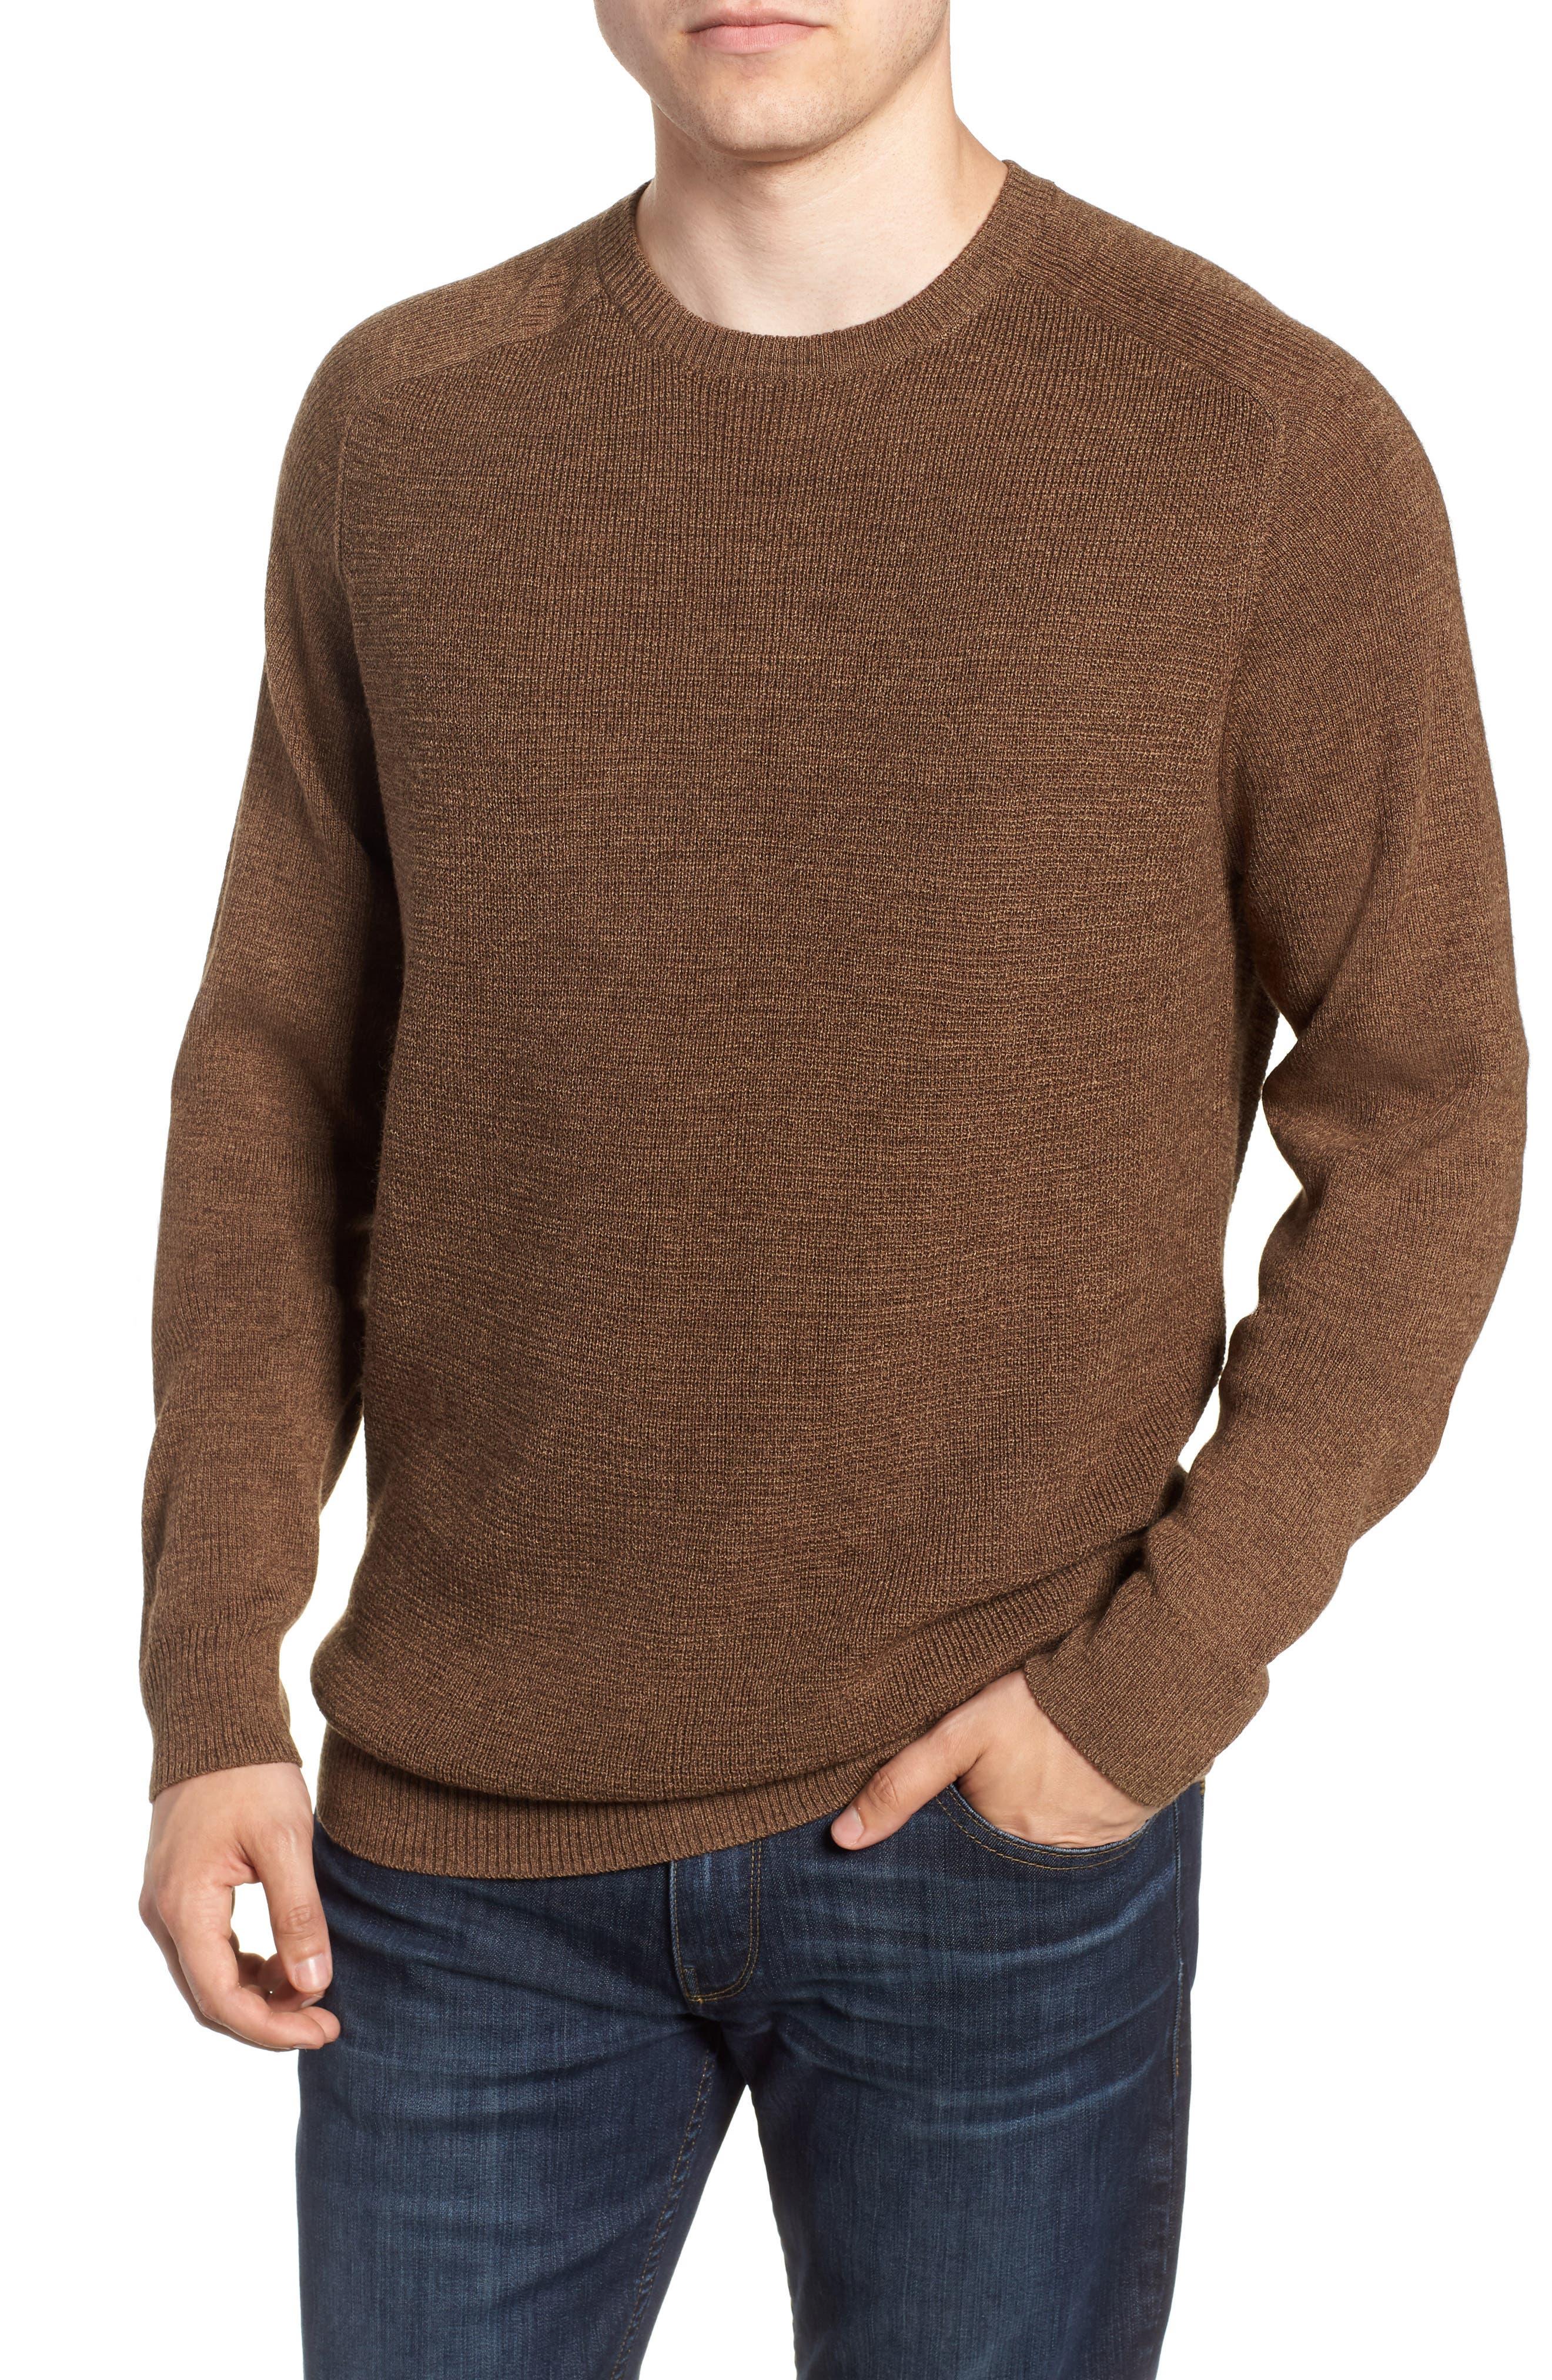 Crewneck Wool Blend Sweater,                             Main thumbnail 1, color,                             BROWN MAJOR